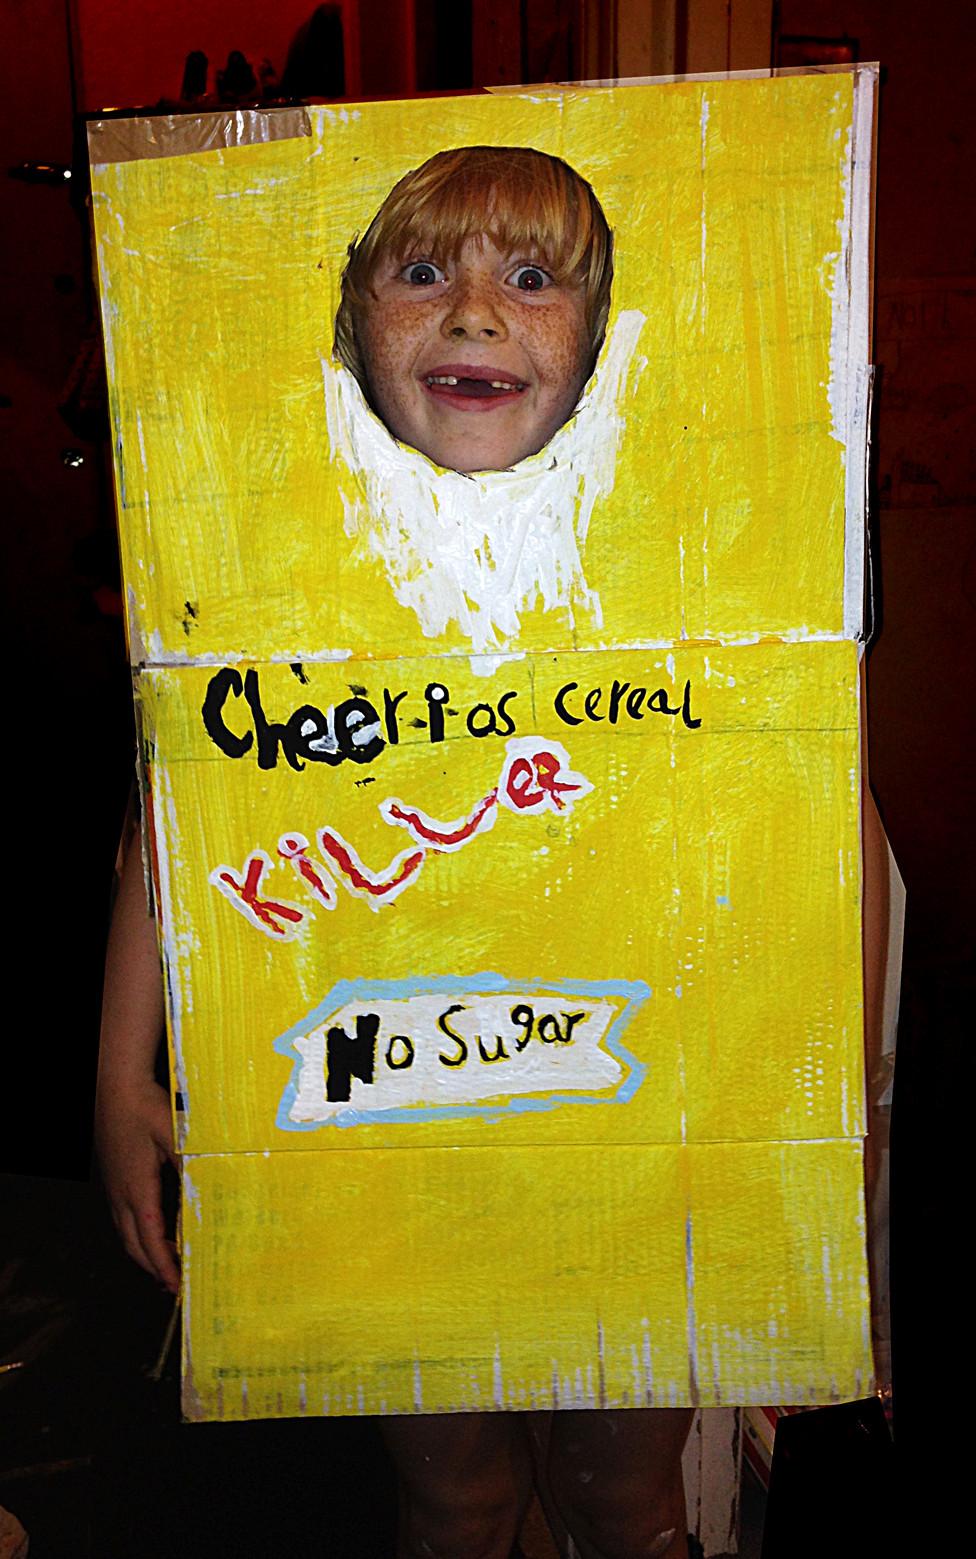 cheerio cereal killer Halloween costume